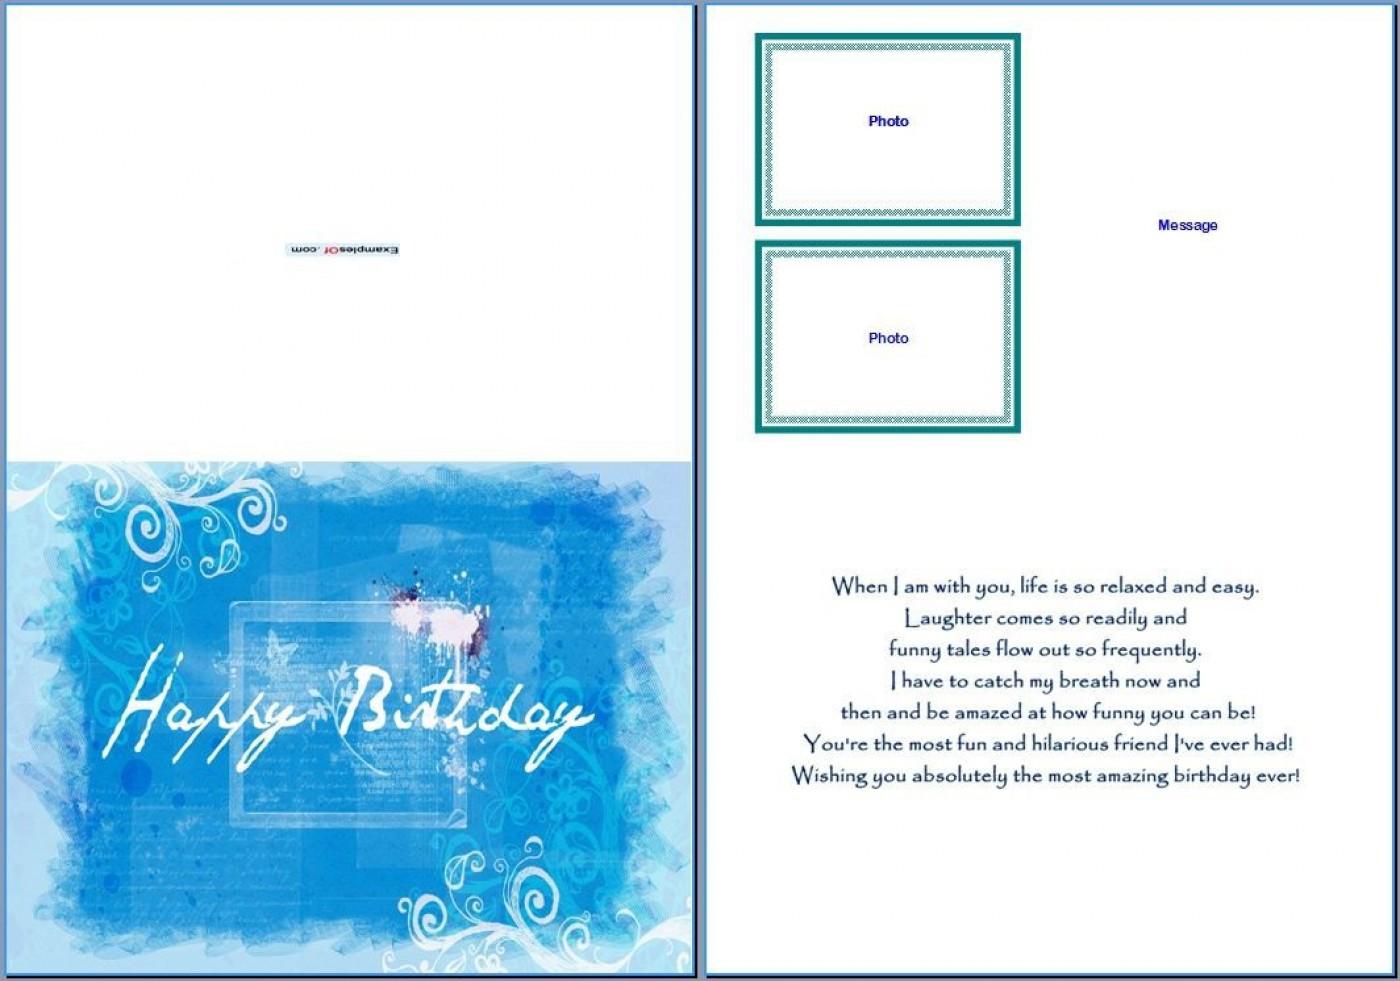 008 Sensational Microsoft Word Card Template Image  Birthday Download Busines Free1400